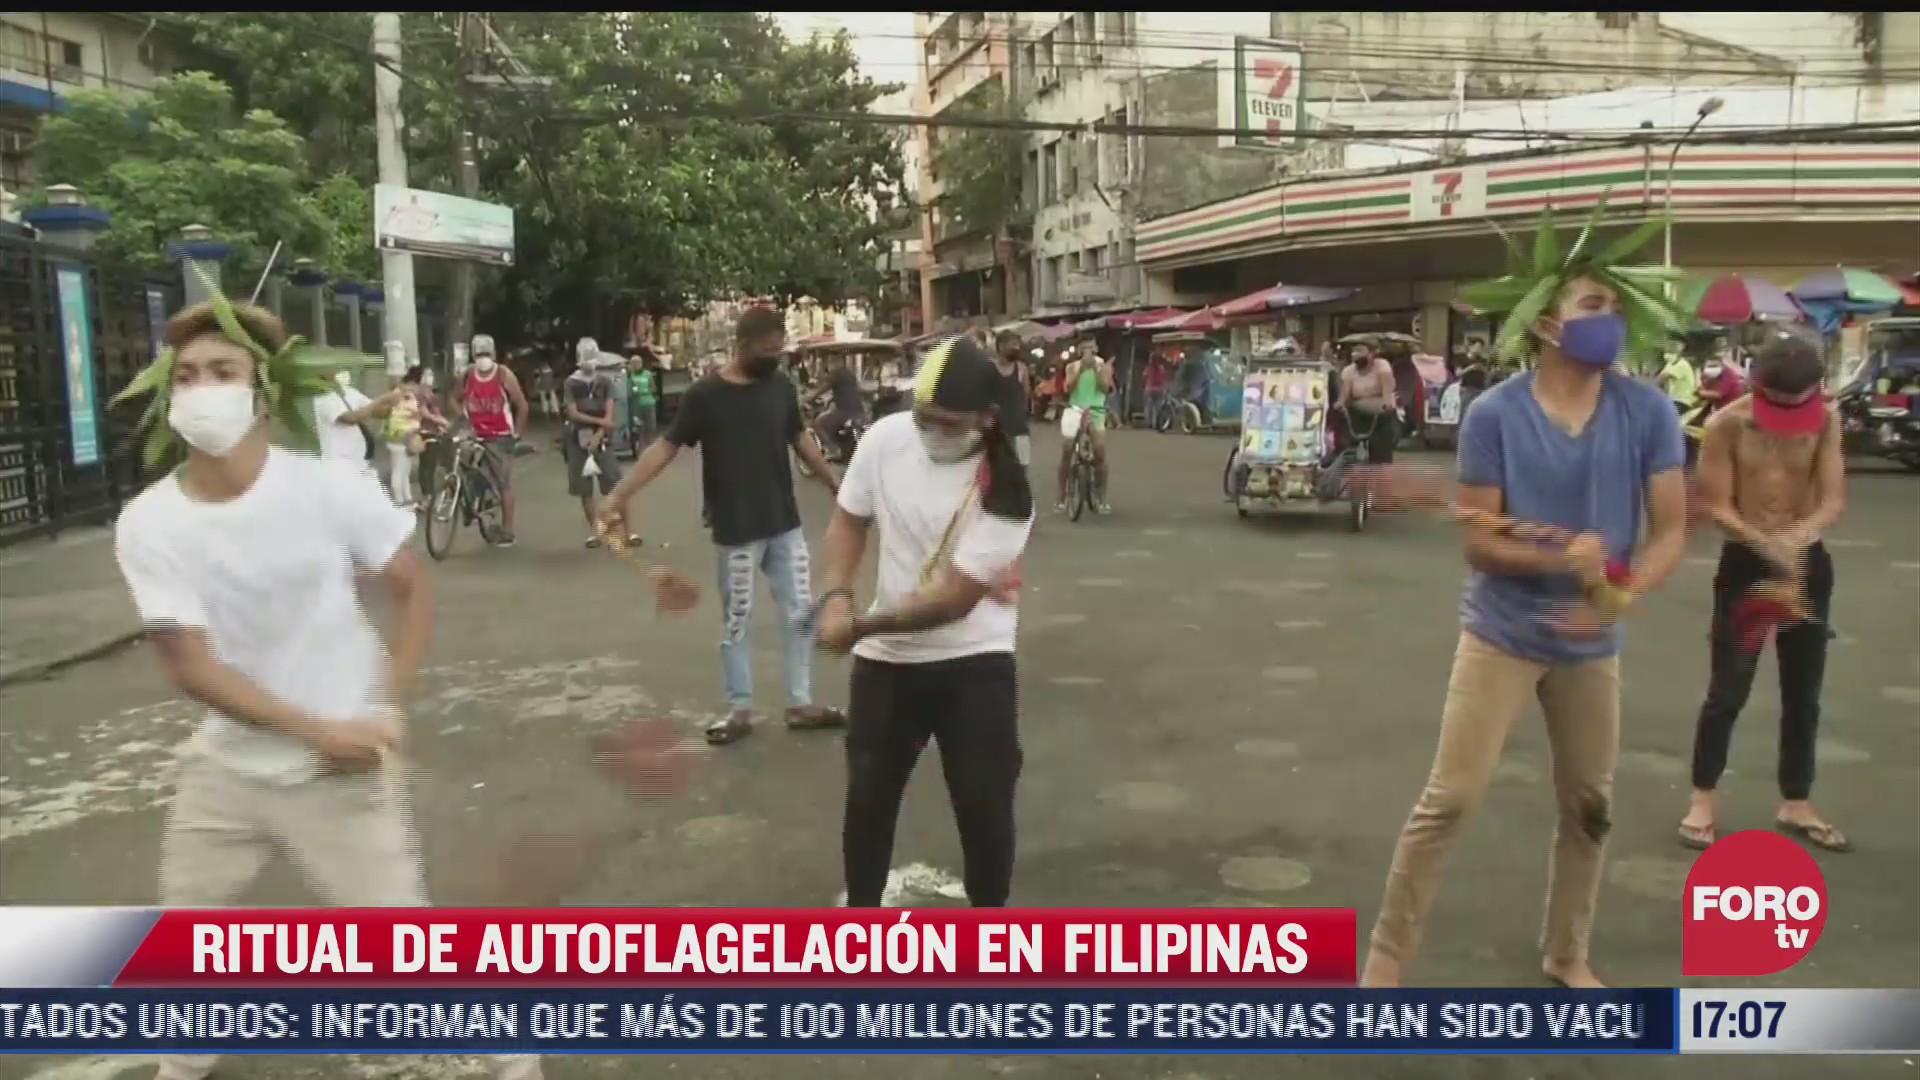 catolicos participan en ritual de autoflagelacion en filipinas